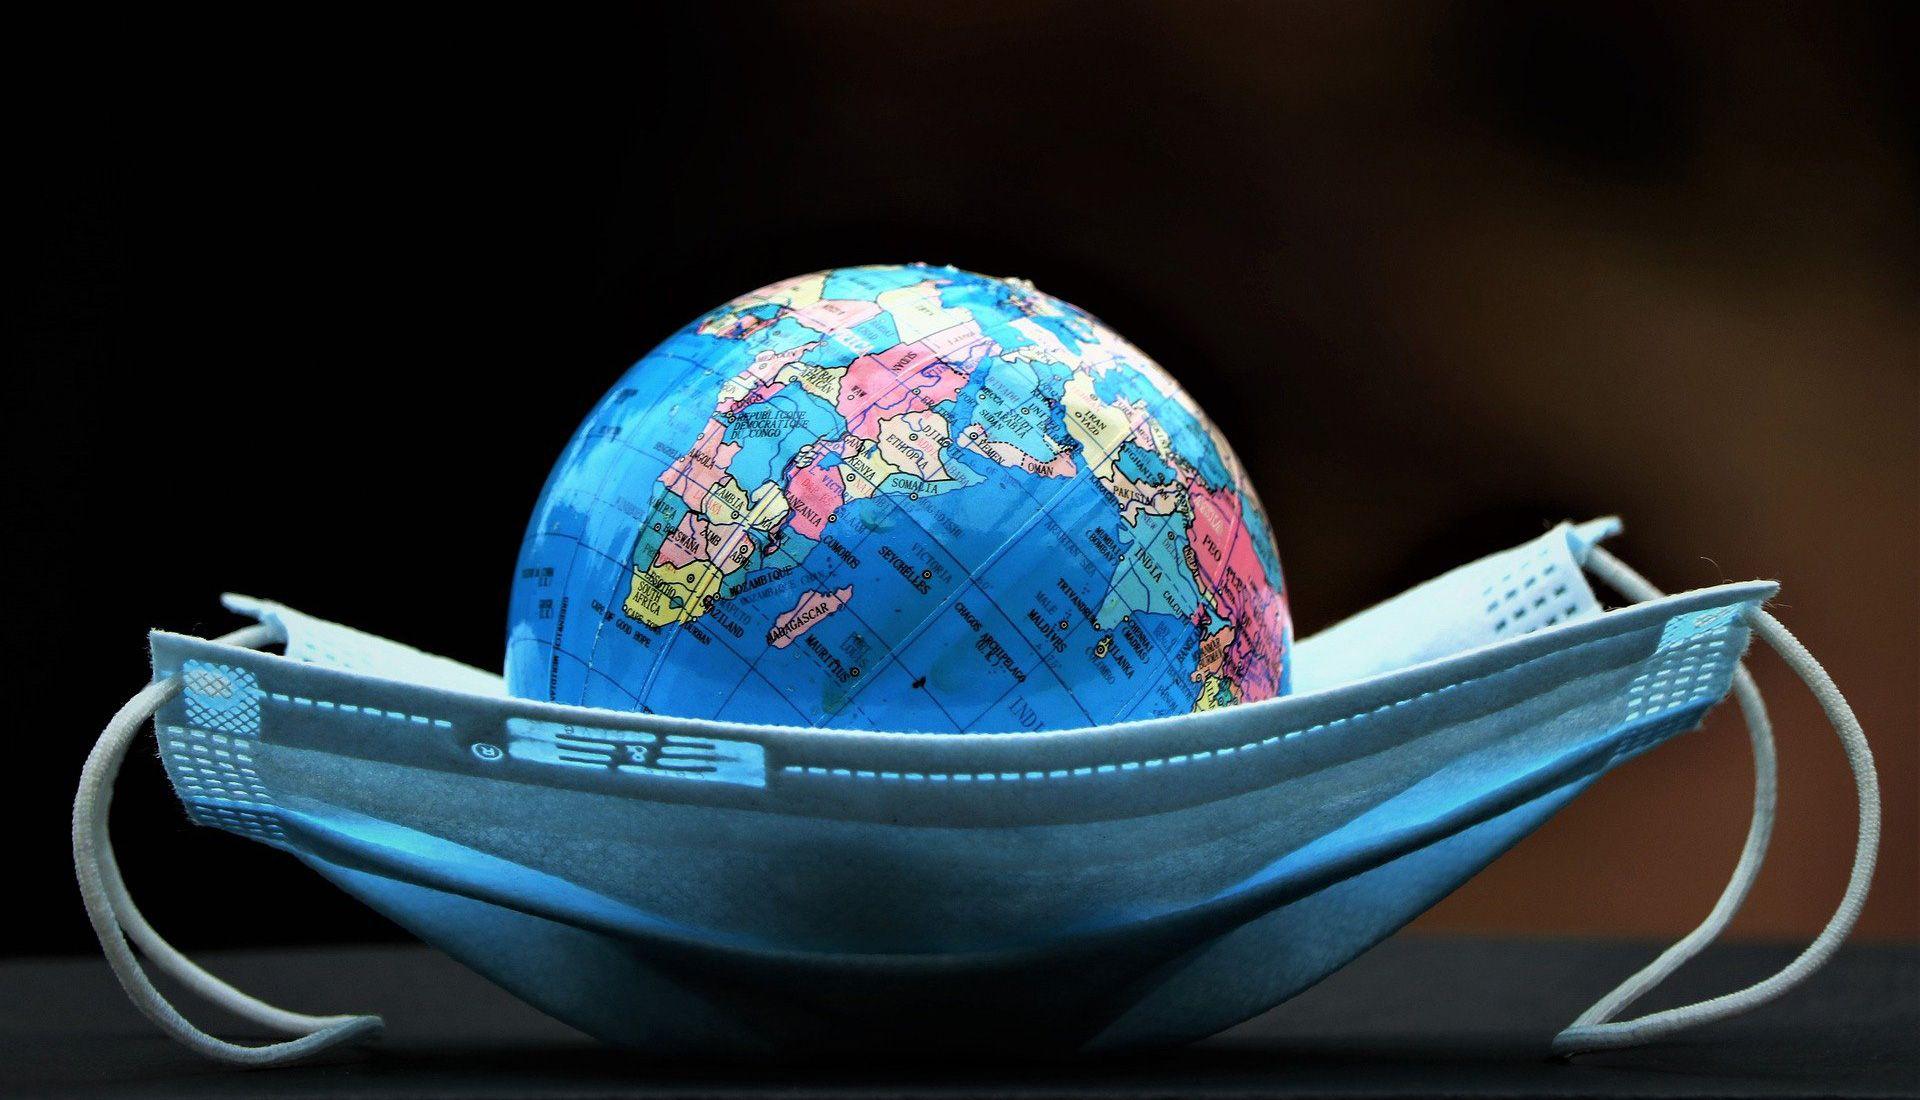 Changements environnementaux et maladies infectieuses